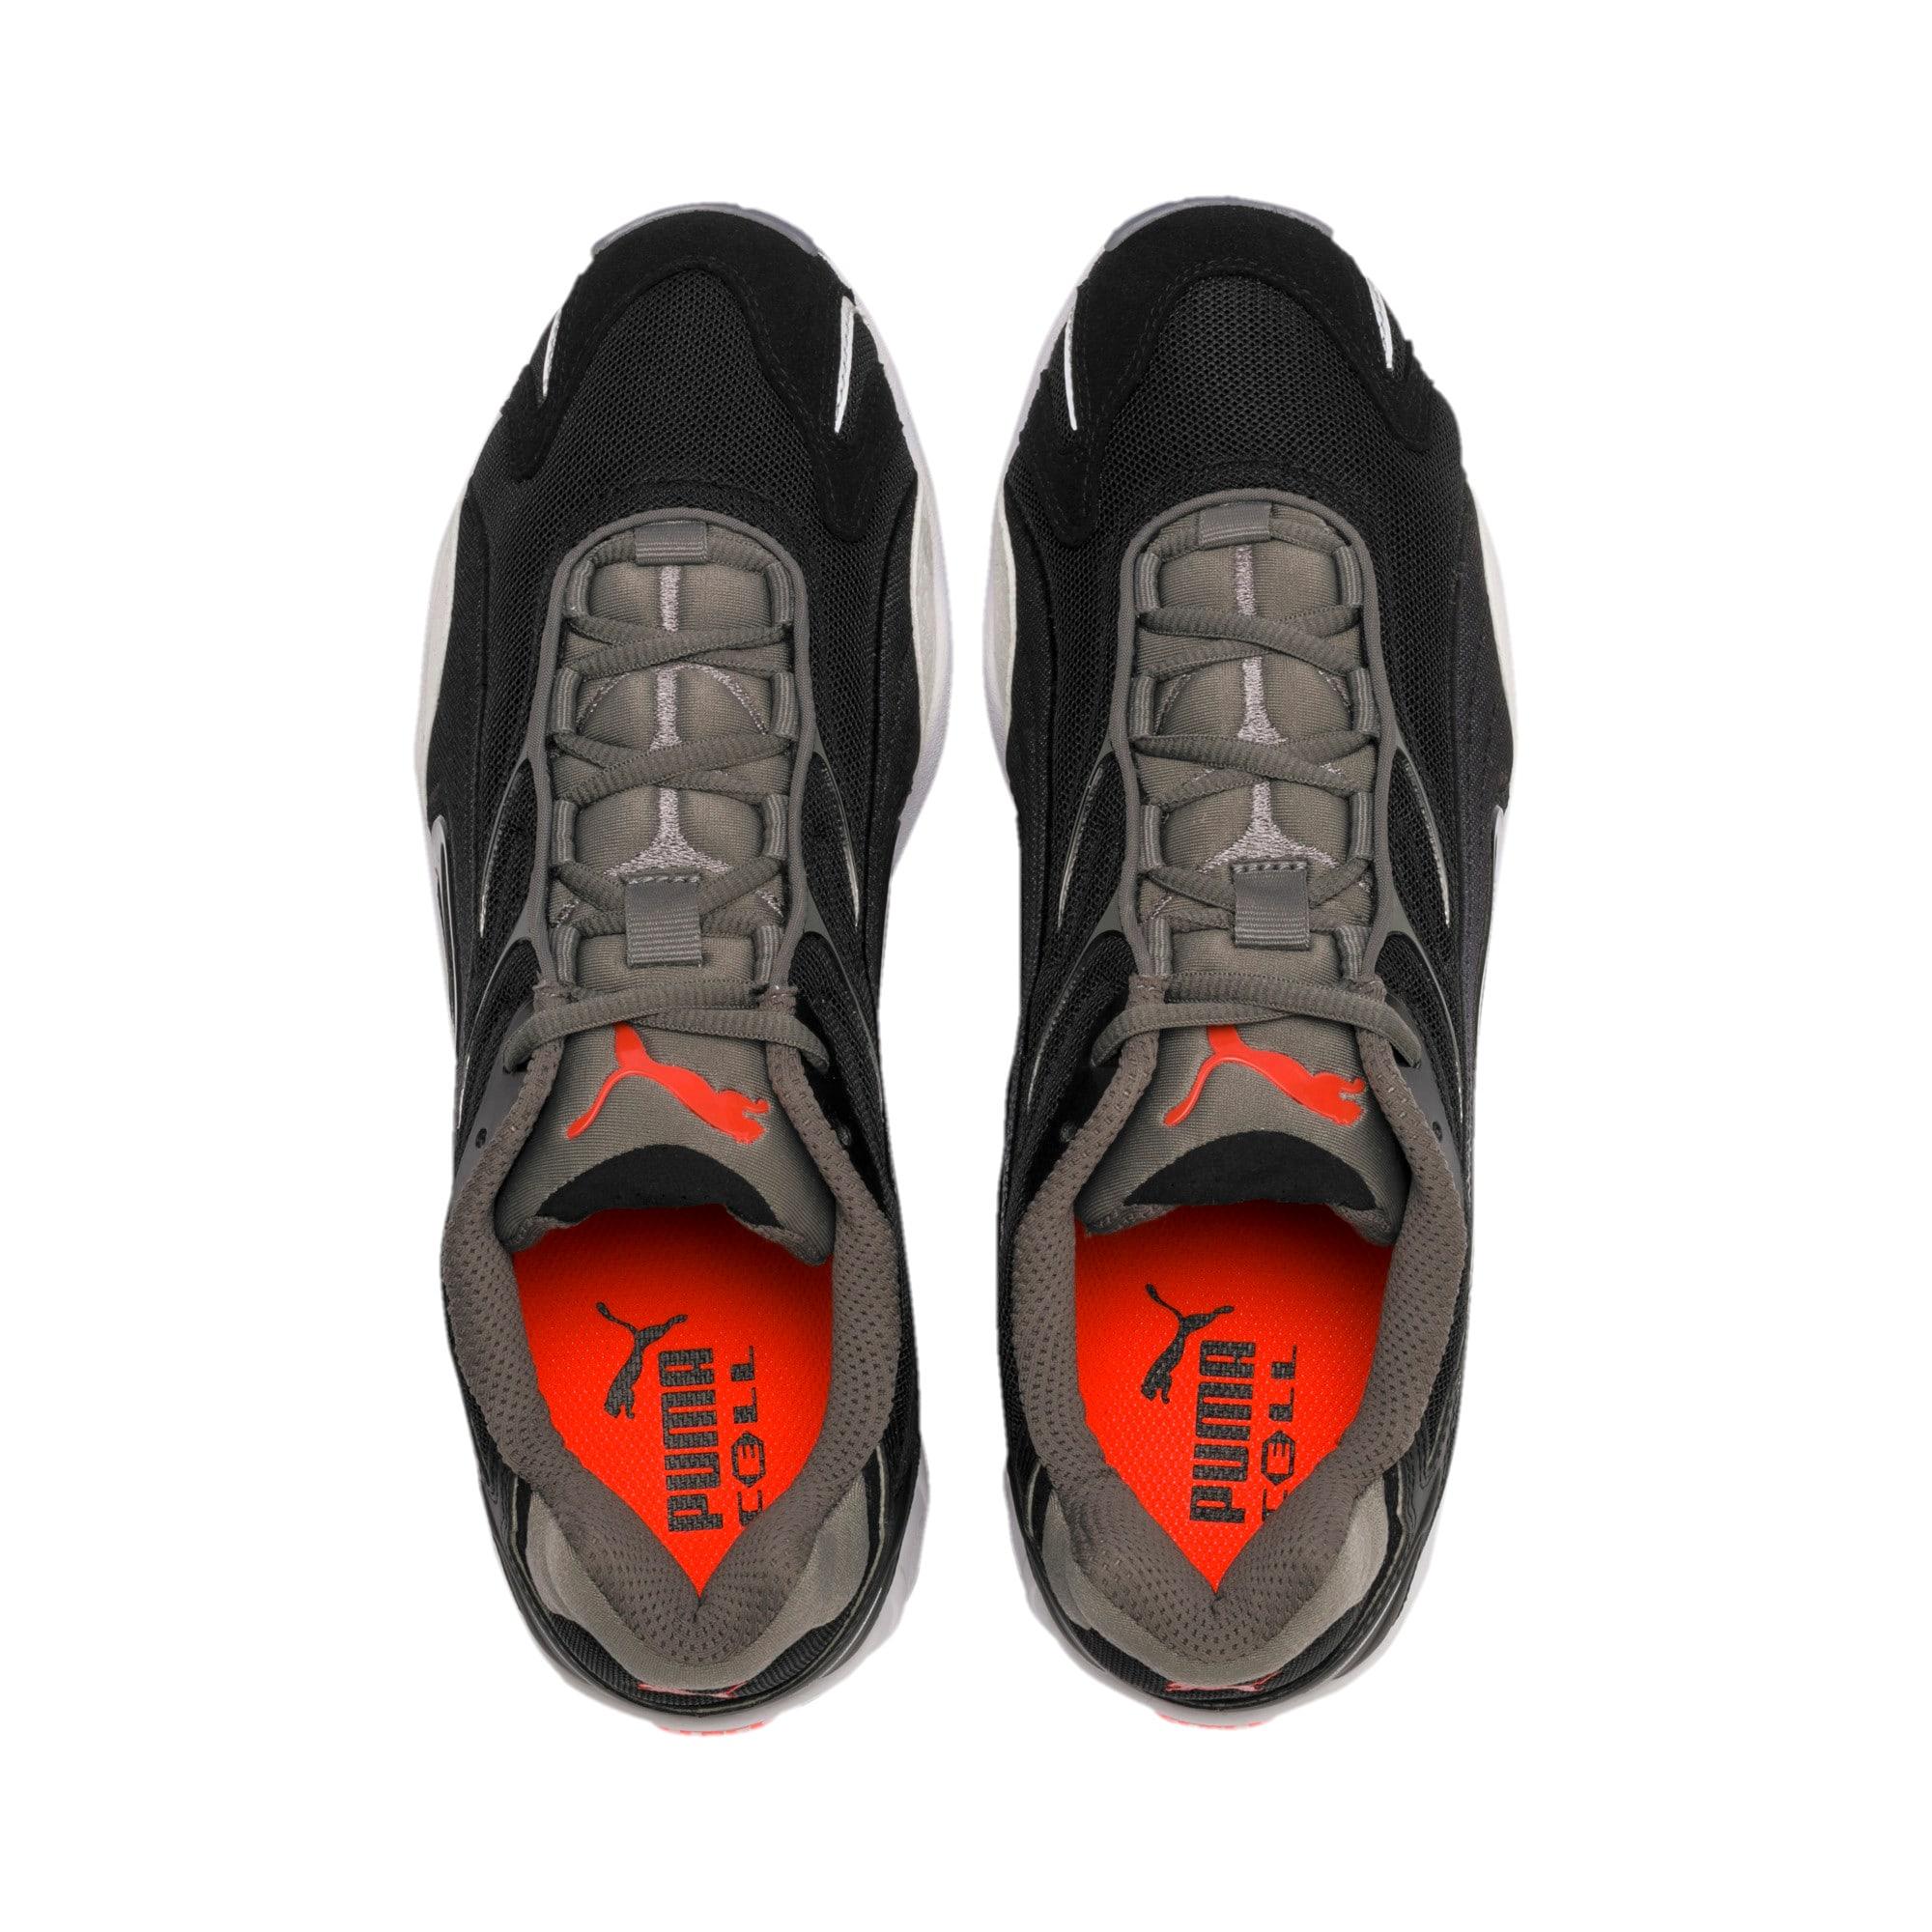 Thumbnail 7 of Inhale Flares Sneakers, Puma Black-Puma White, medium